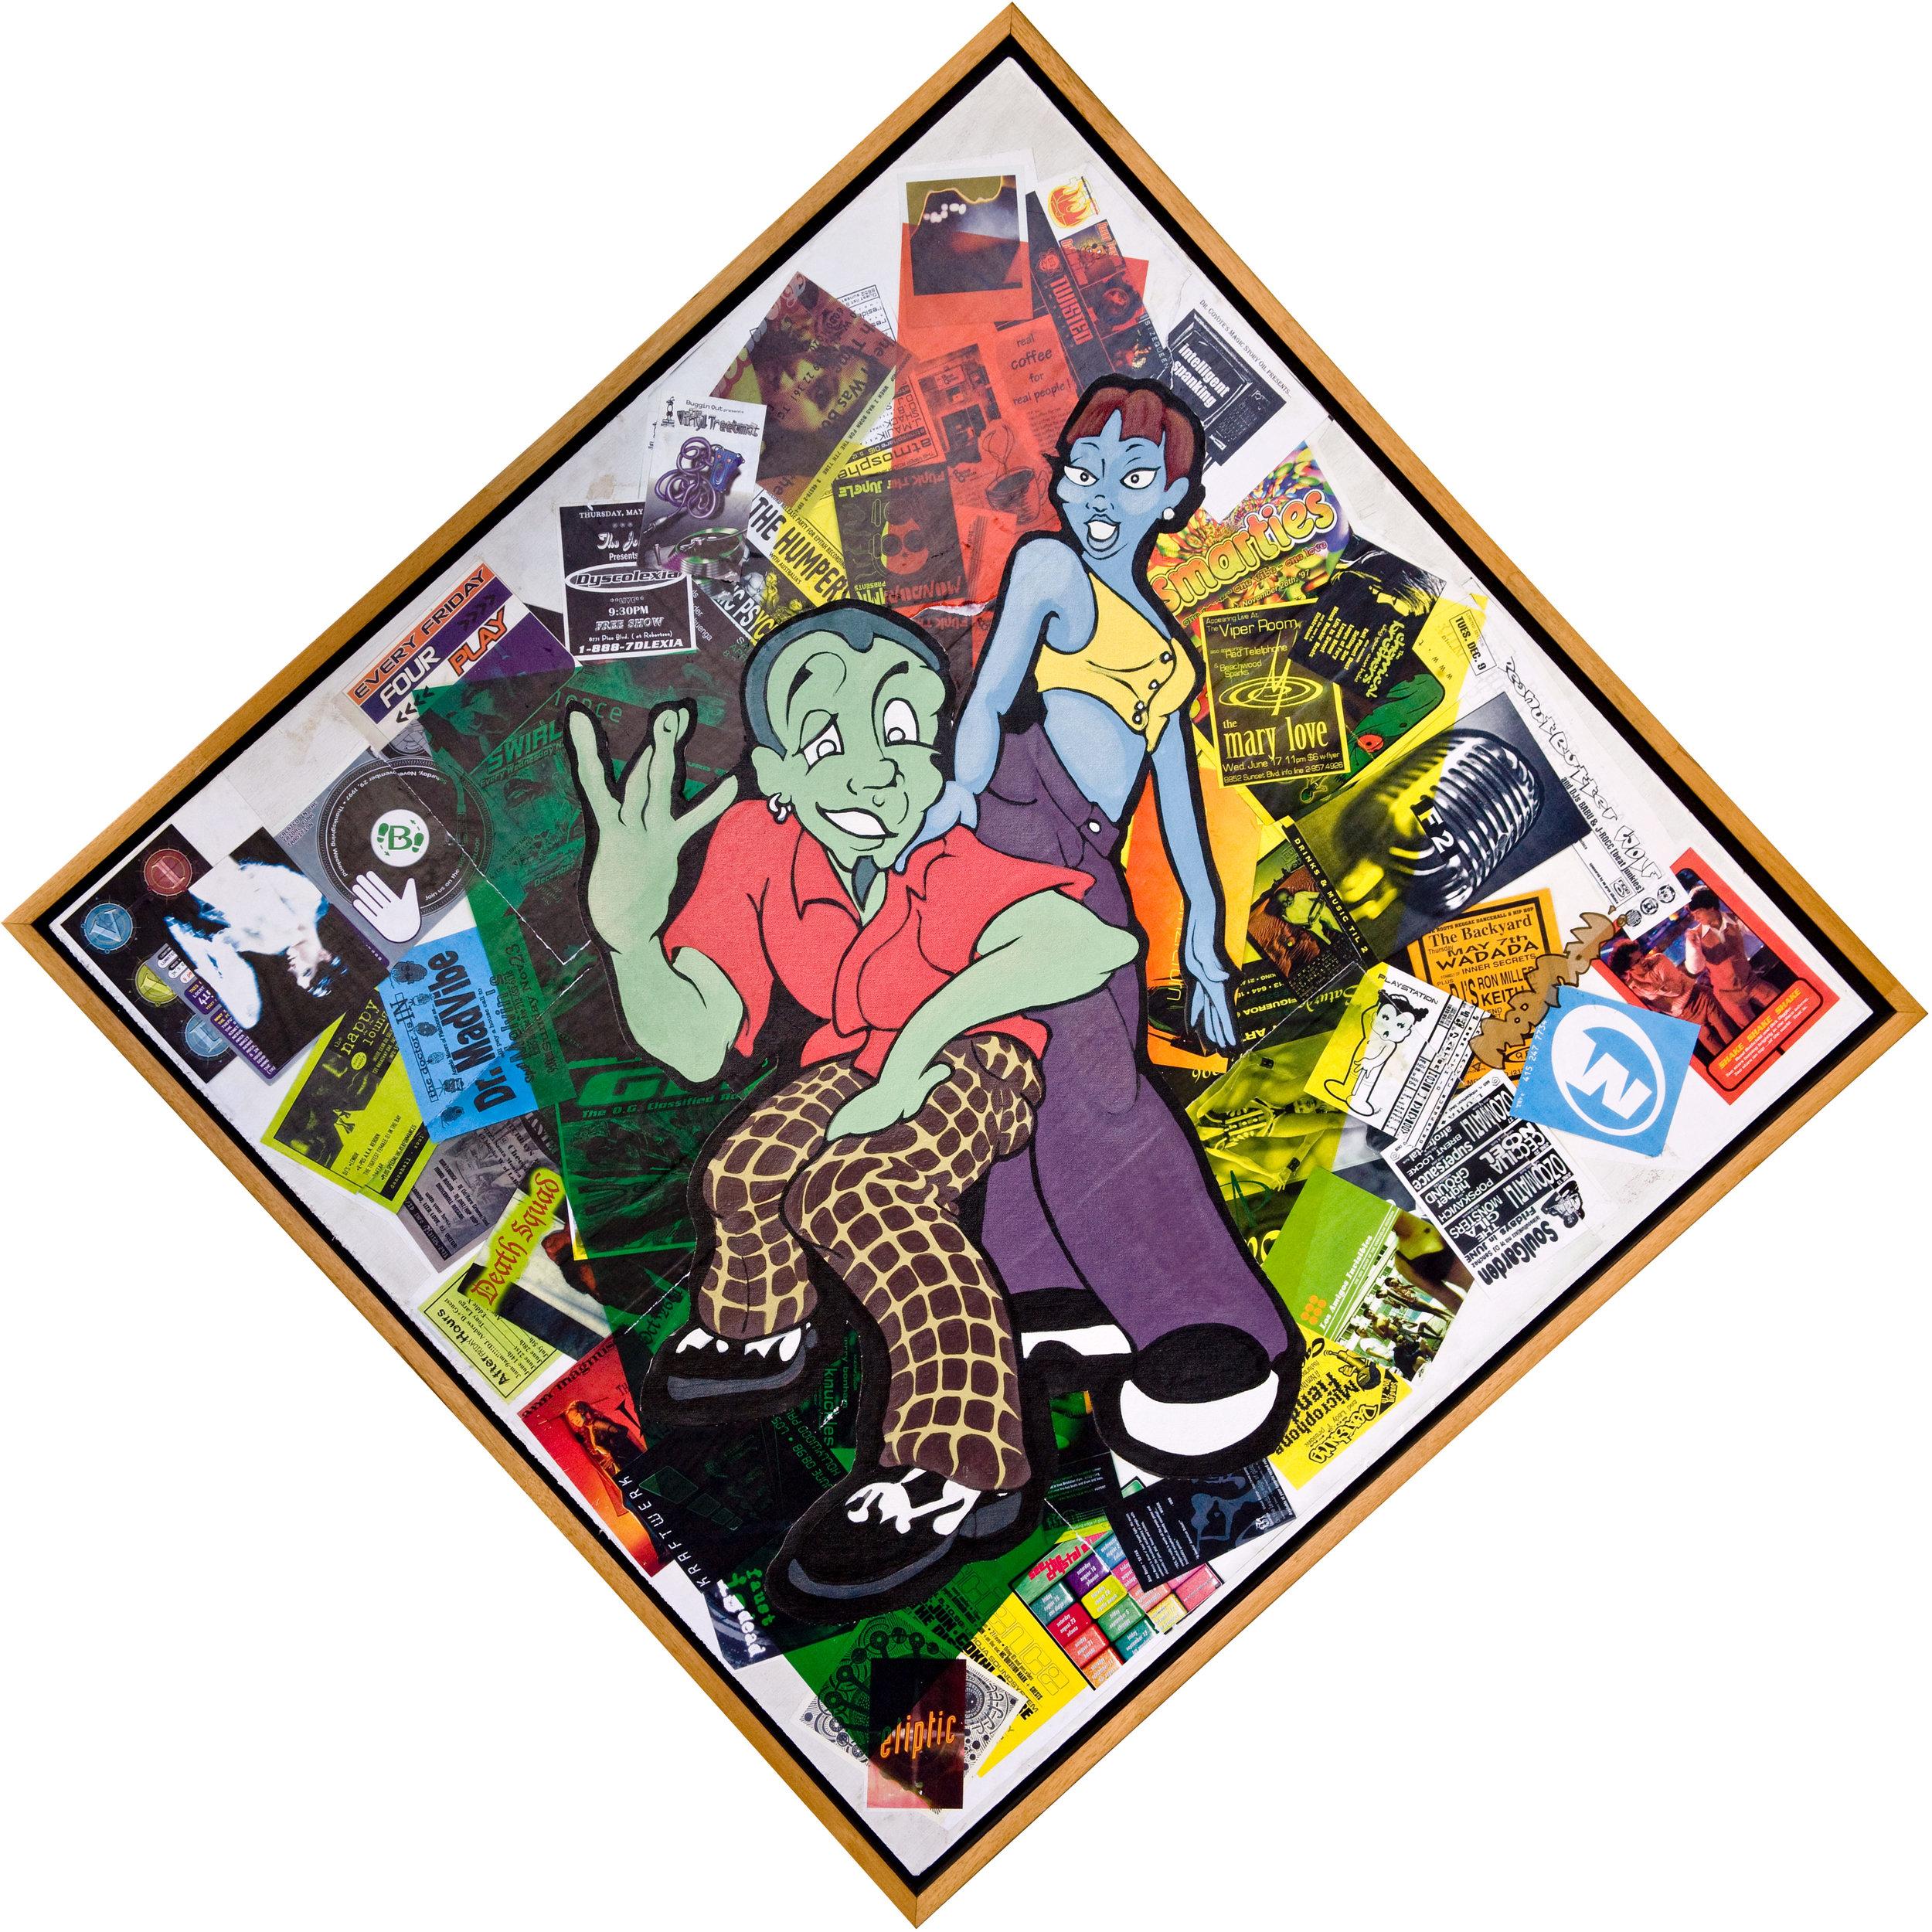 Cornelius 36x36 acrylic on canvas over found imagery collage on hardwood ply